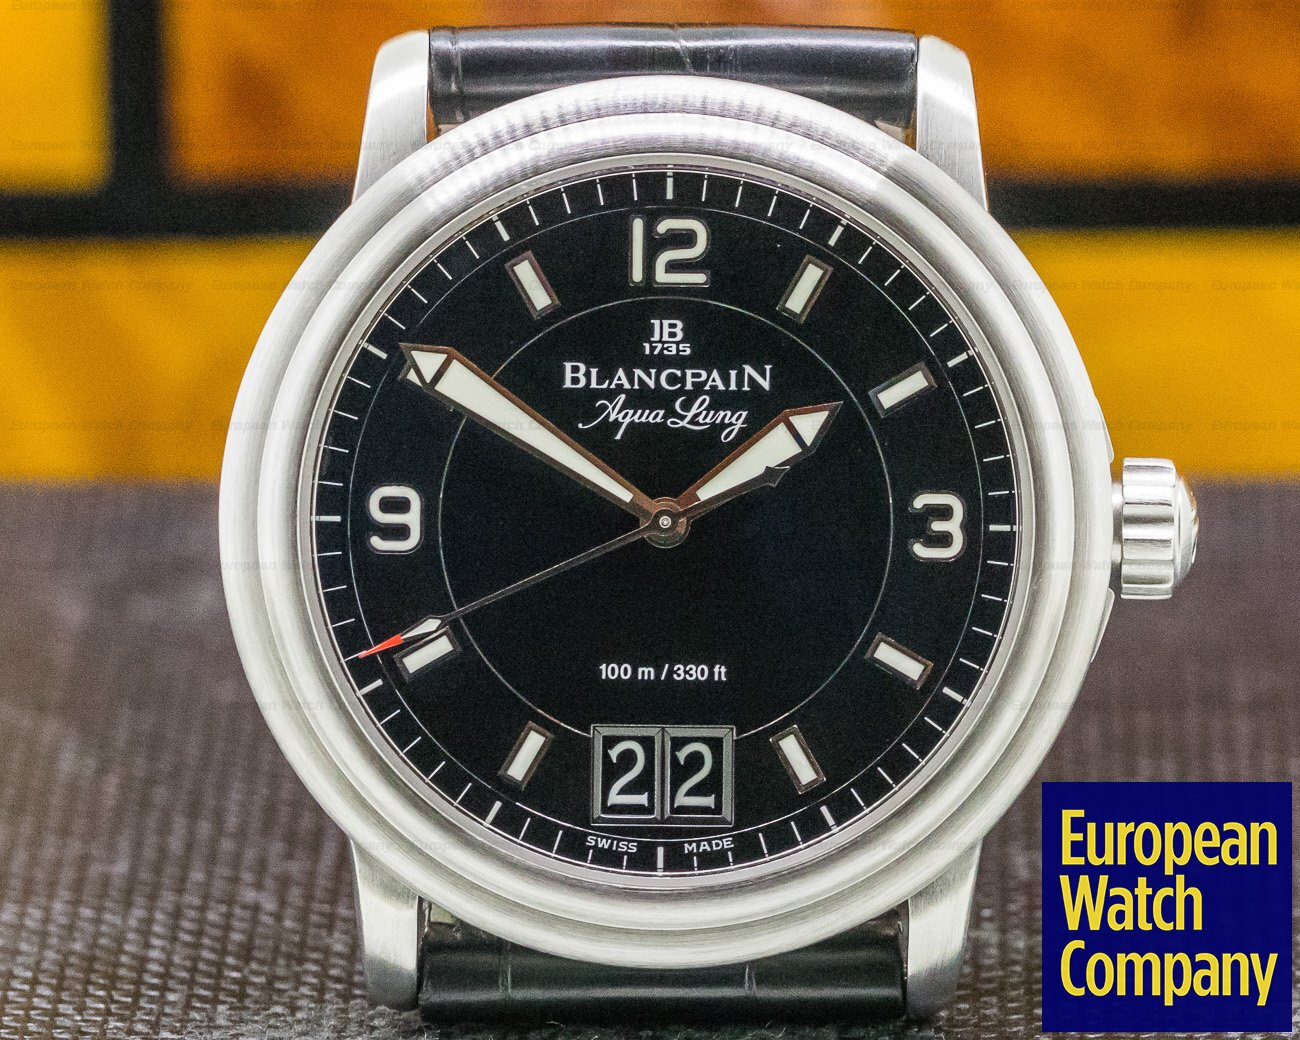 Blancpain 2850B-1130A-71 Aqualung Big Date Black Dial VLADAMIR PUTIN Limited SS